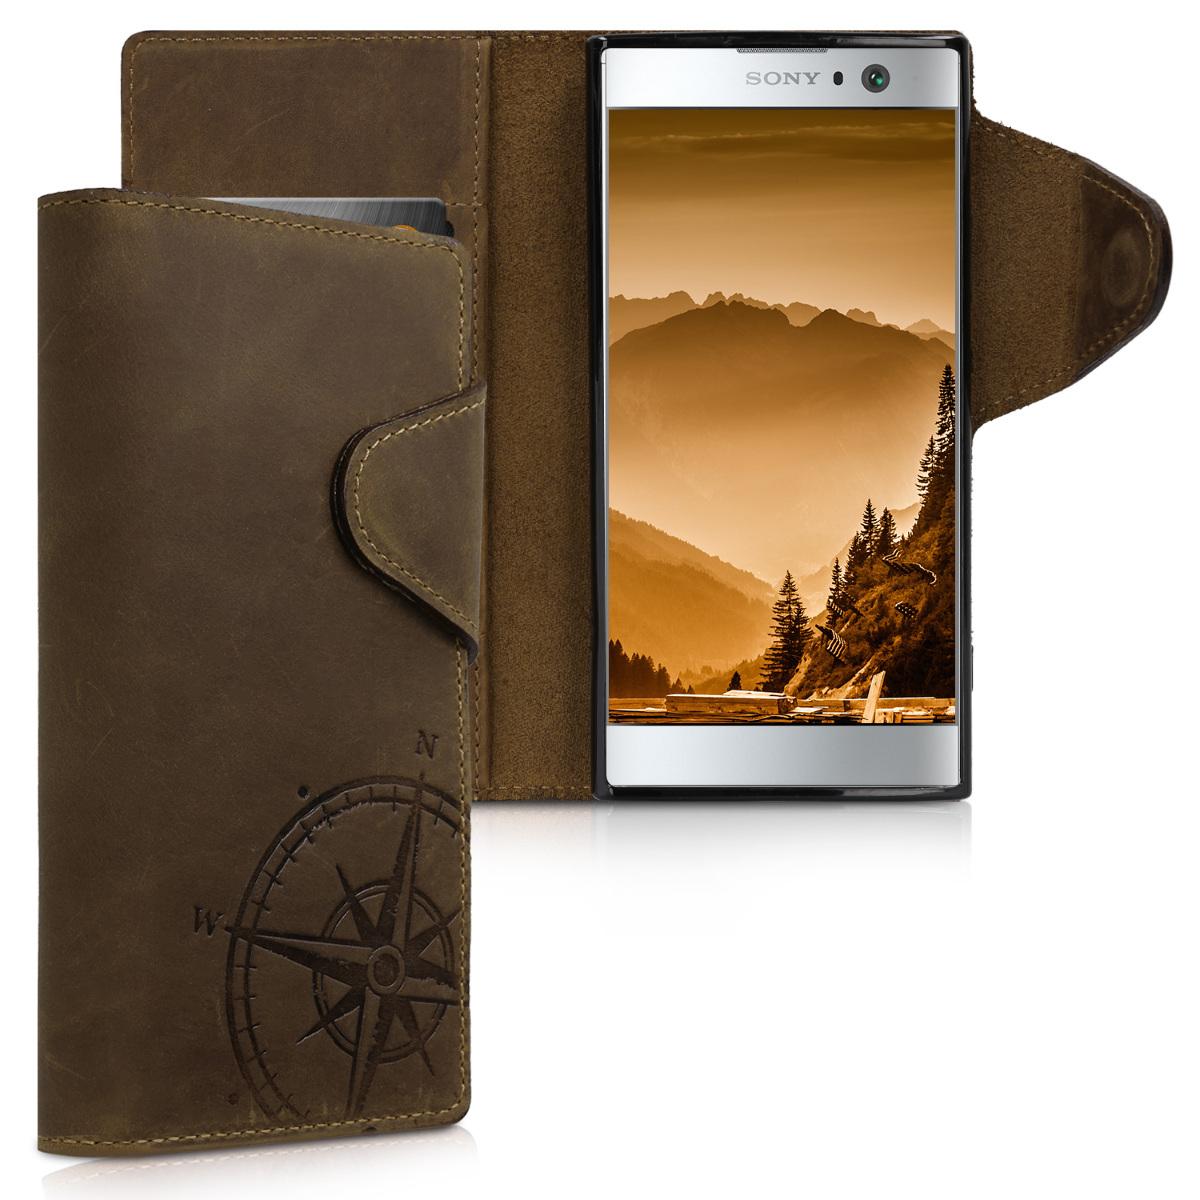 Kalibri Δερμάτινη Suede Θήκη - Πορτοφόλι Sony Xperia XA2 - Brown Compass (45837.01)